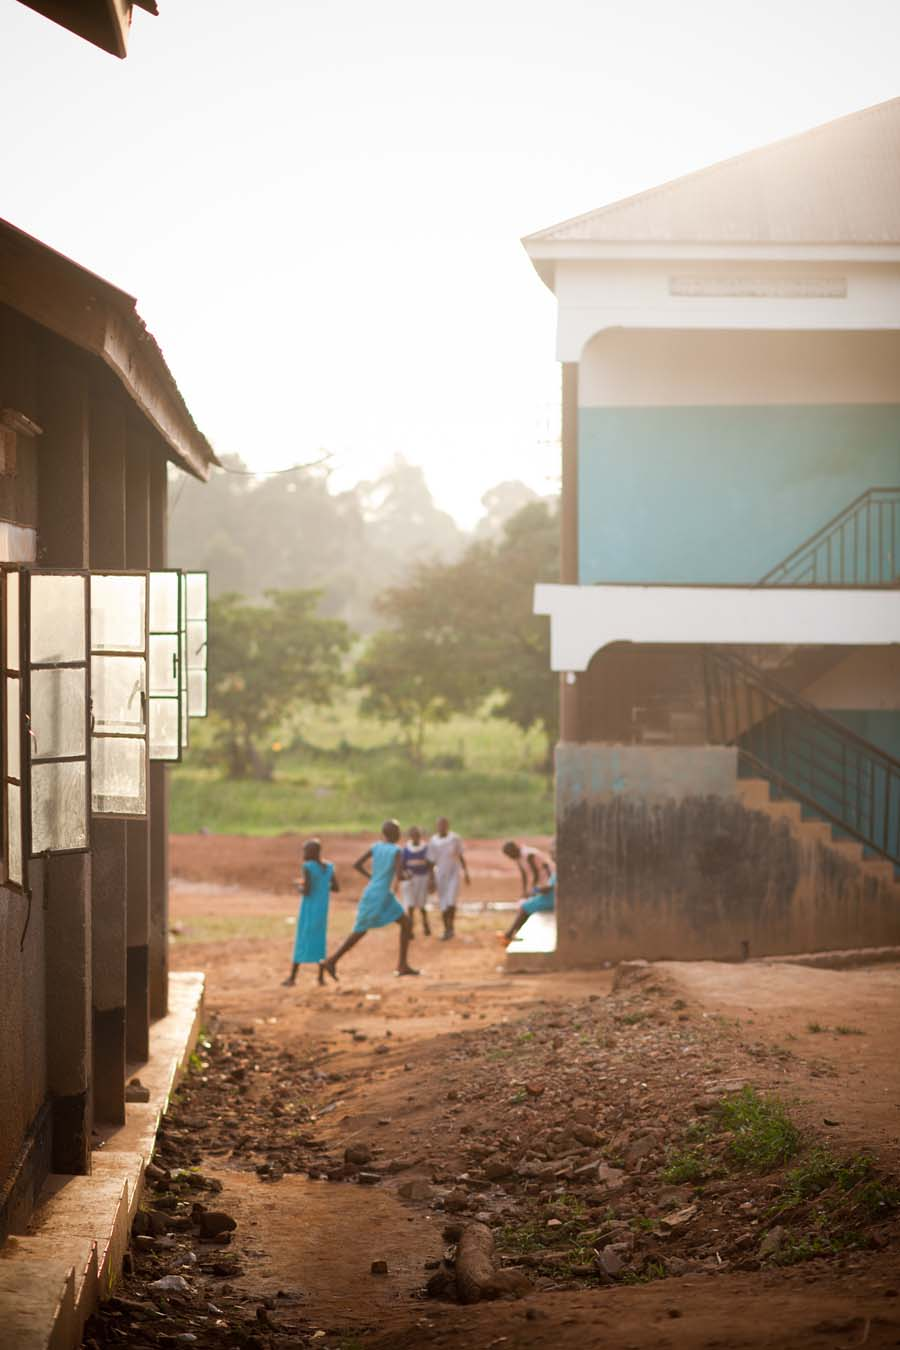 jessicadavisphotography.com | Jessica Davis Photography | Portrait Work in Uganda| Travel Photographer | World Event Photographs 4 (5).jpg